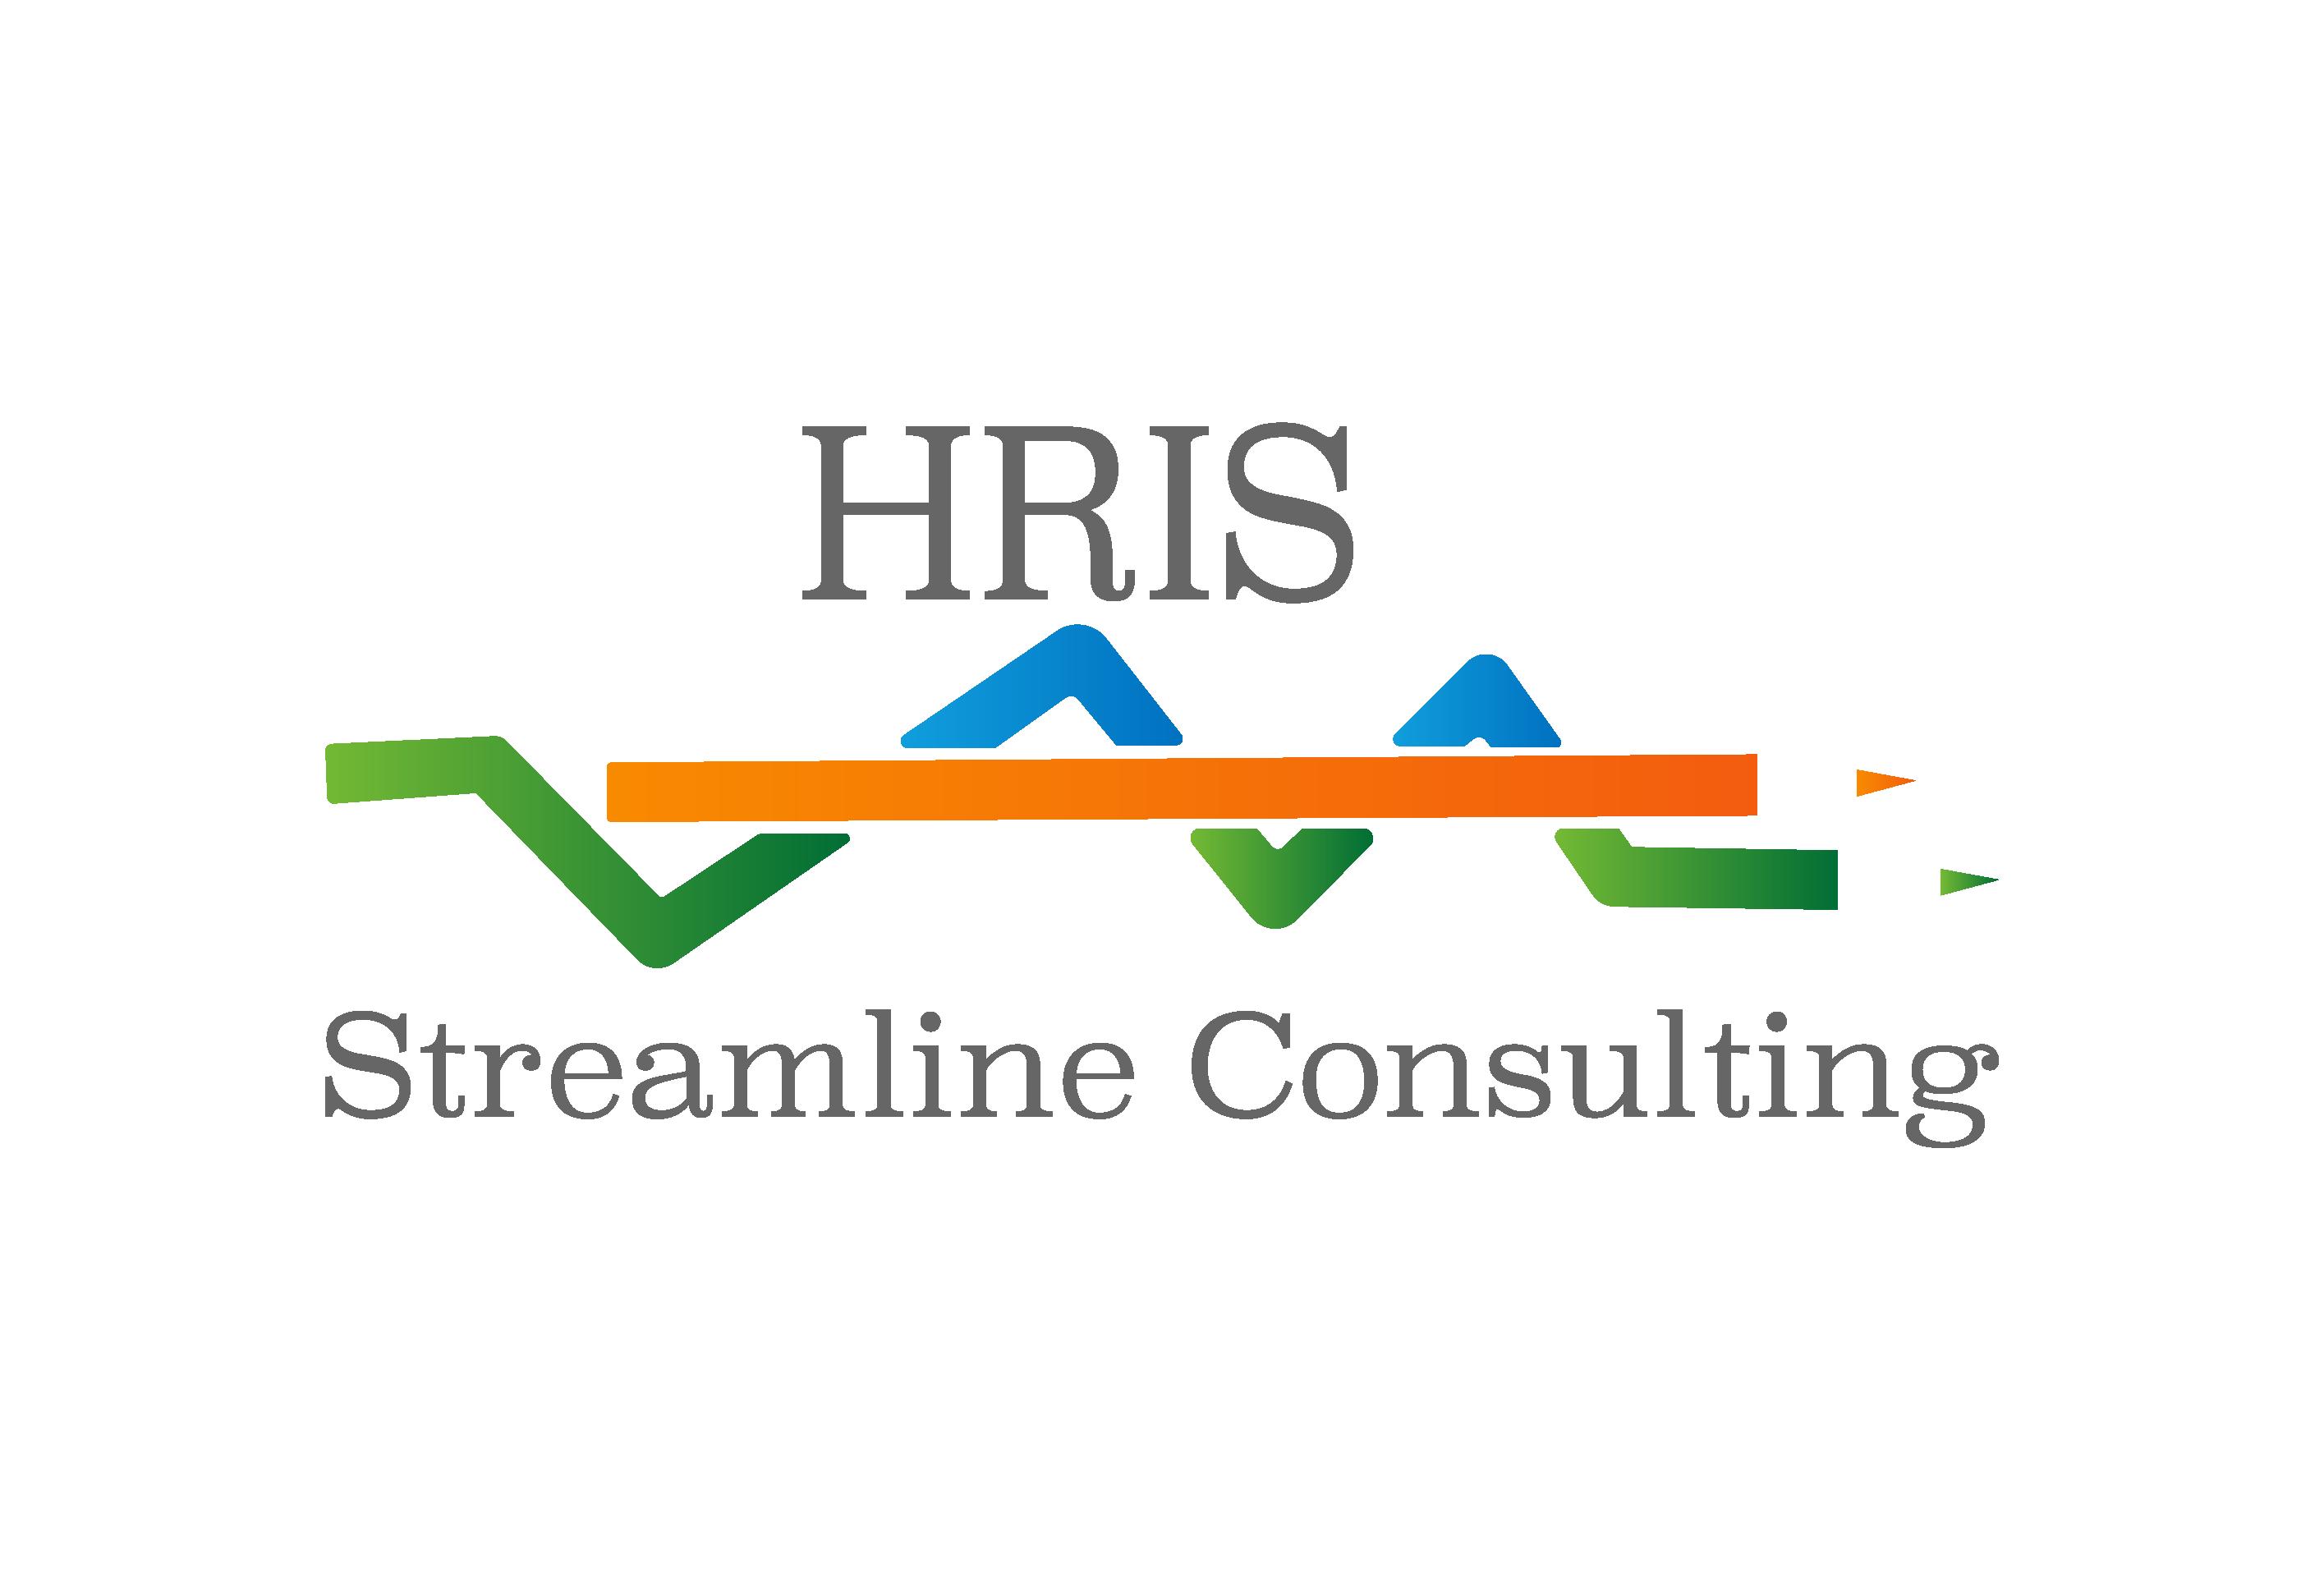 HRIS Streamline Consulting